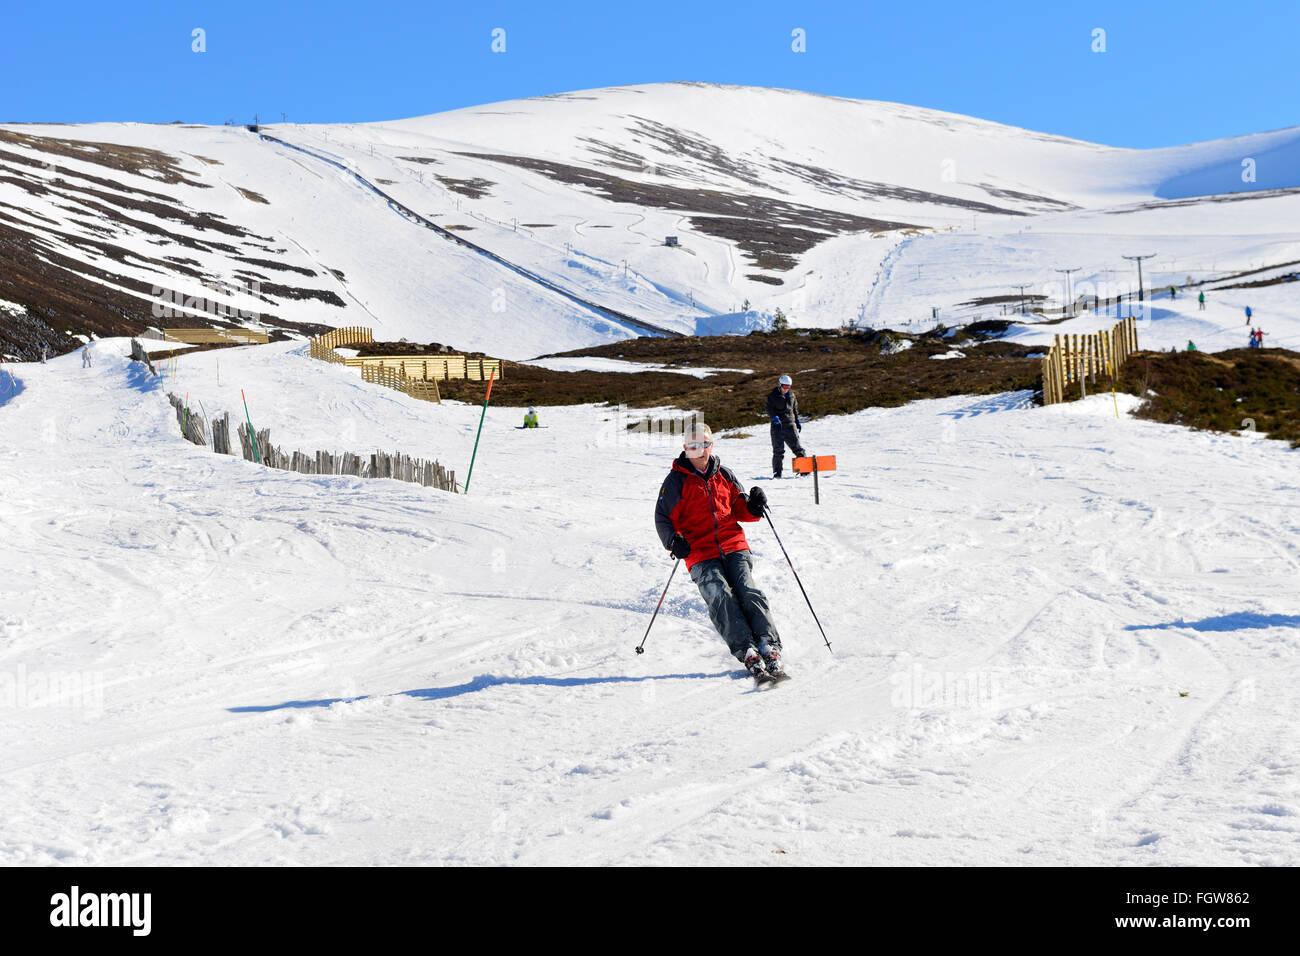 Skiers on downhill run at Cairngorm Mountain Ski Centre, Aviemore, Scottish Highlands, UK - Stock Image